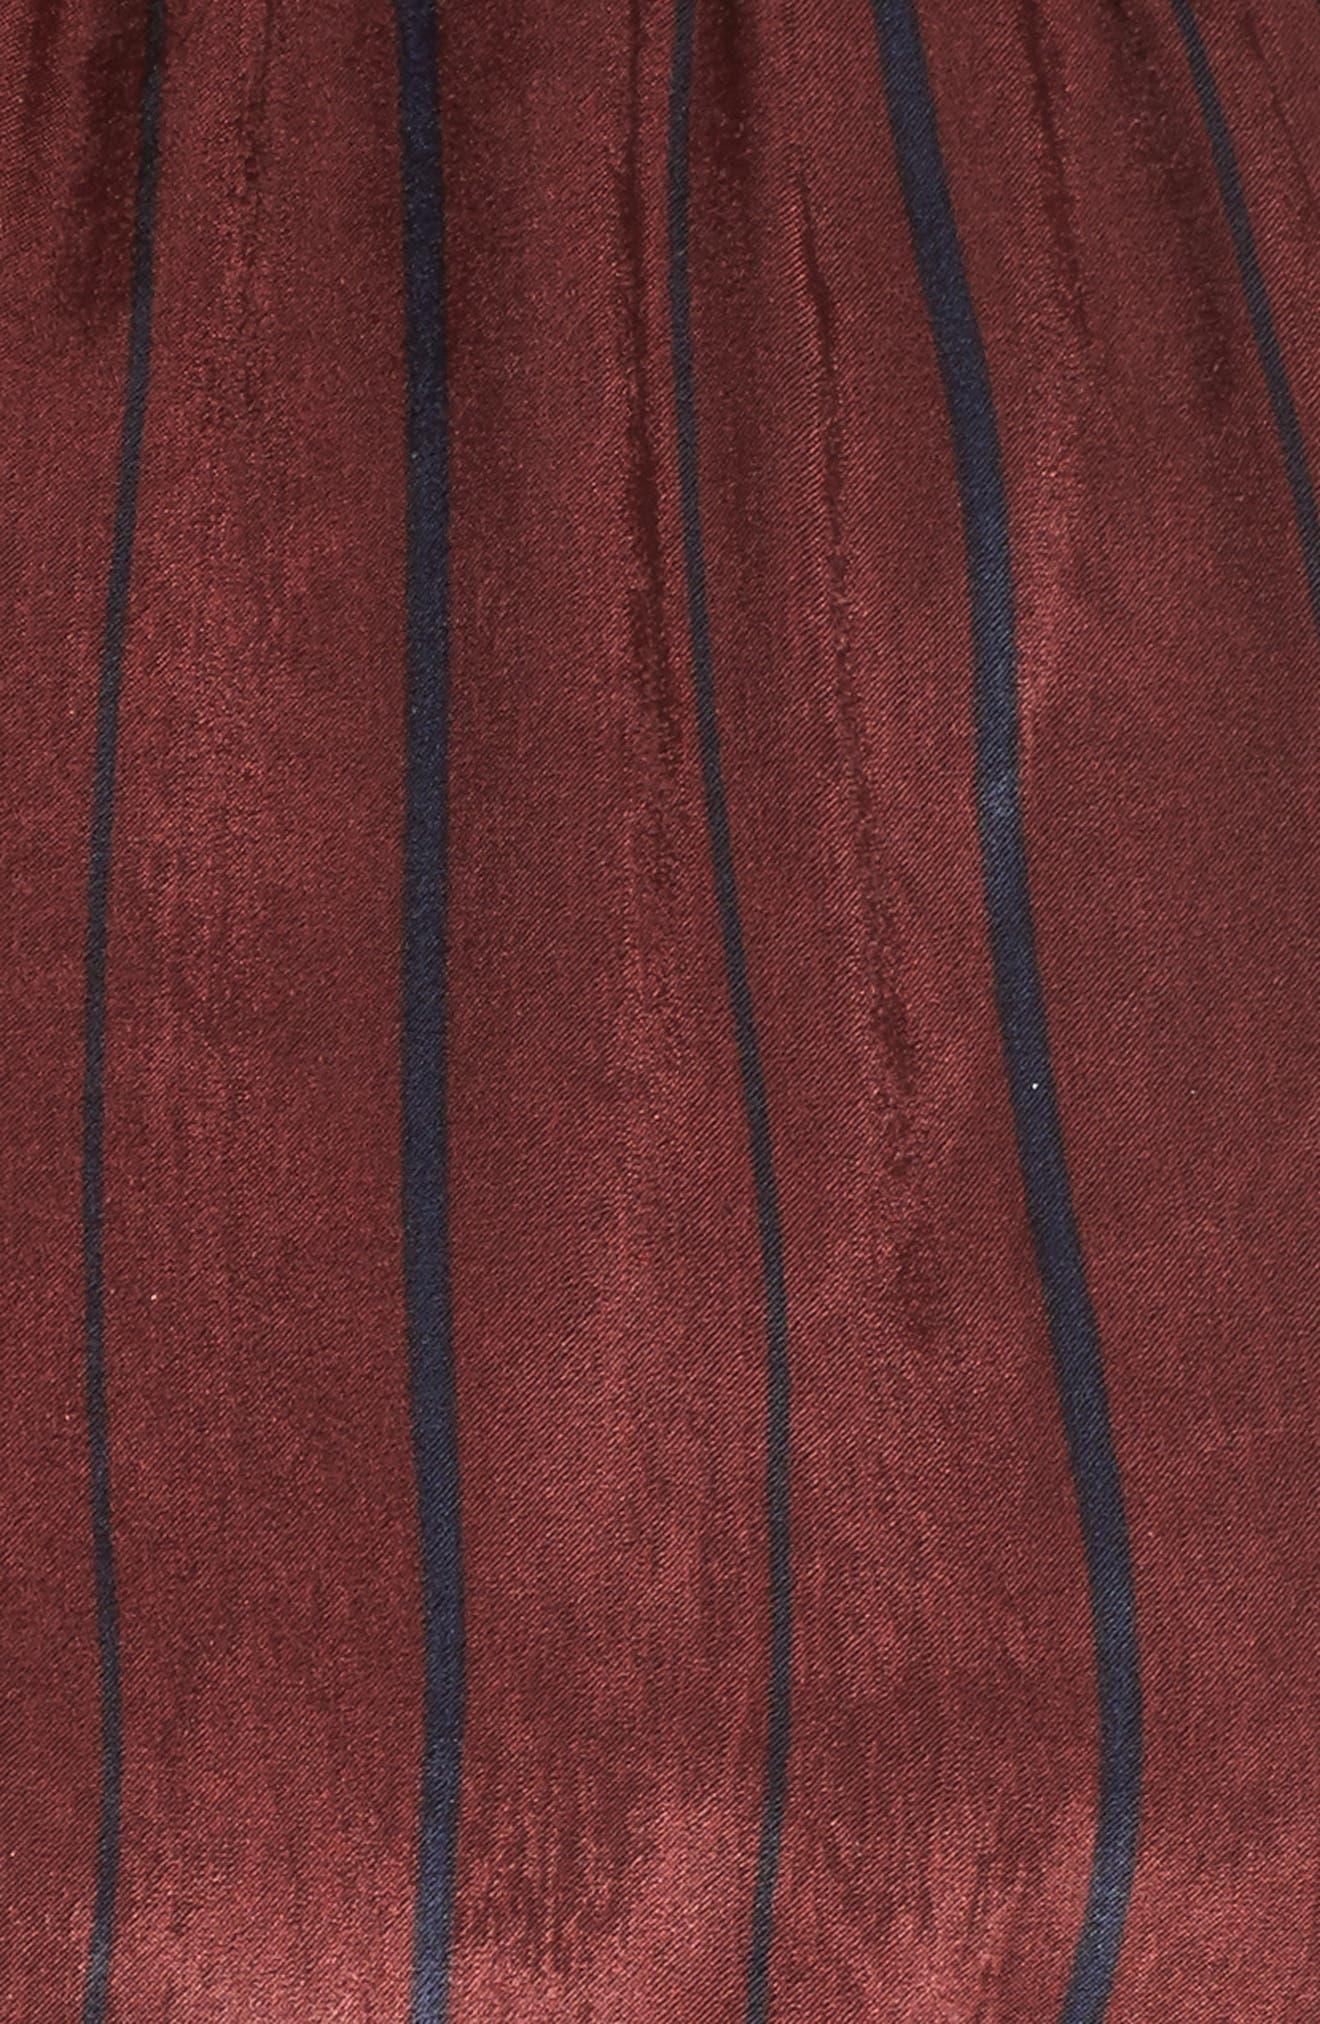 Cold Shoulder Maxi Dress,                             Alternate thumbnail 5, color,                             Wine Multi